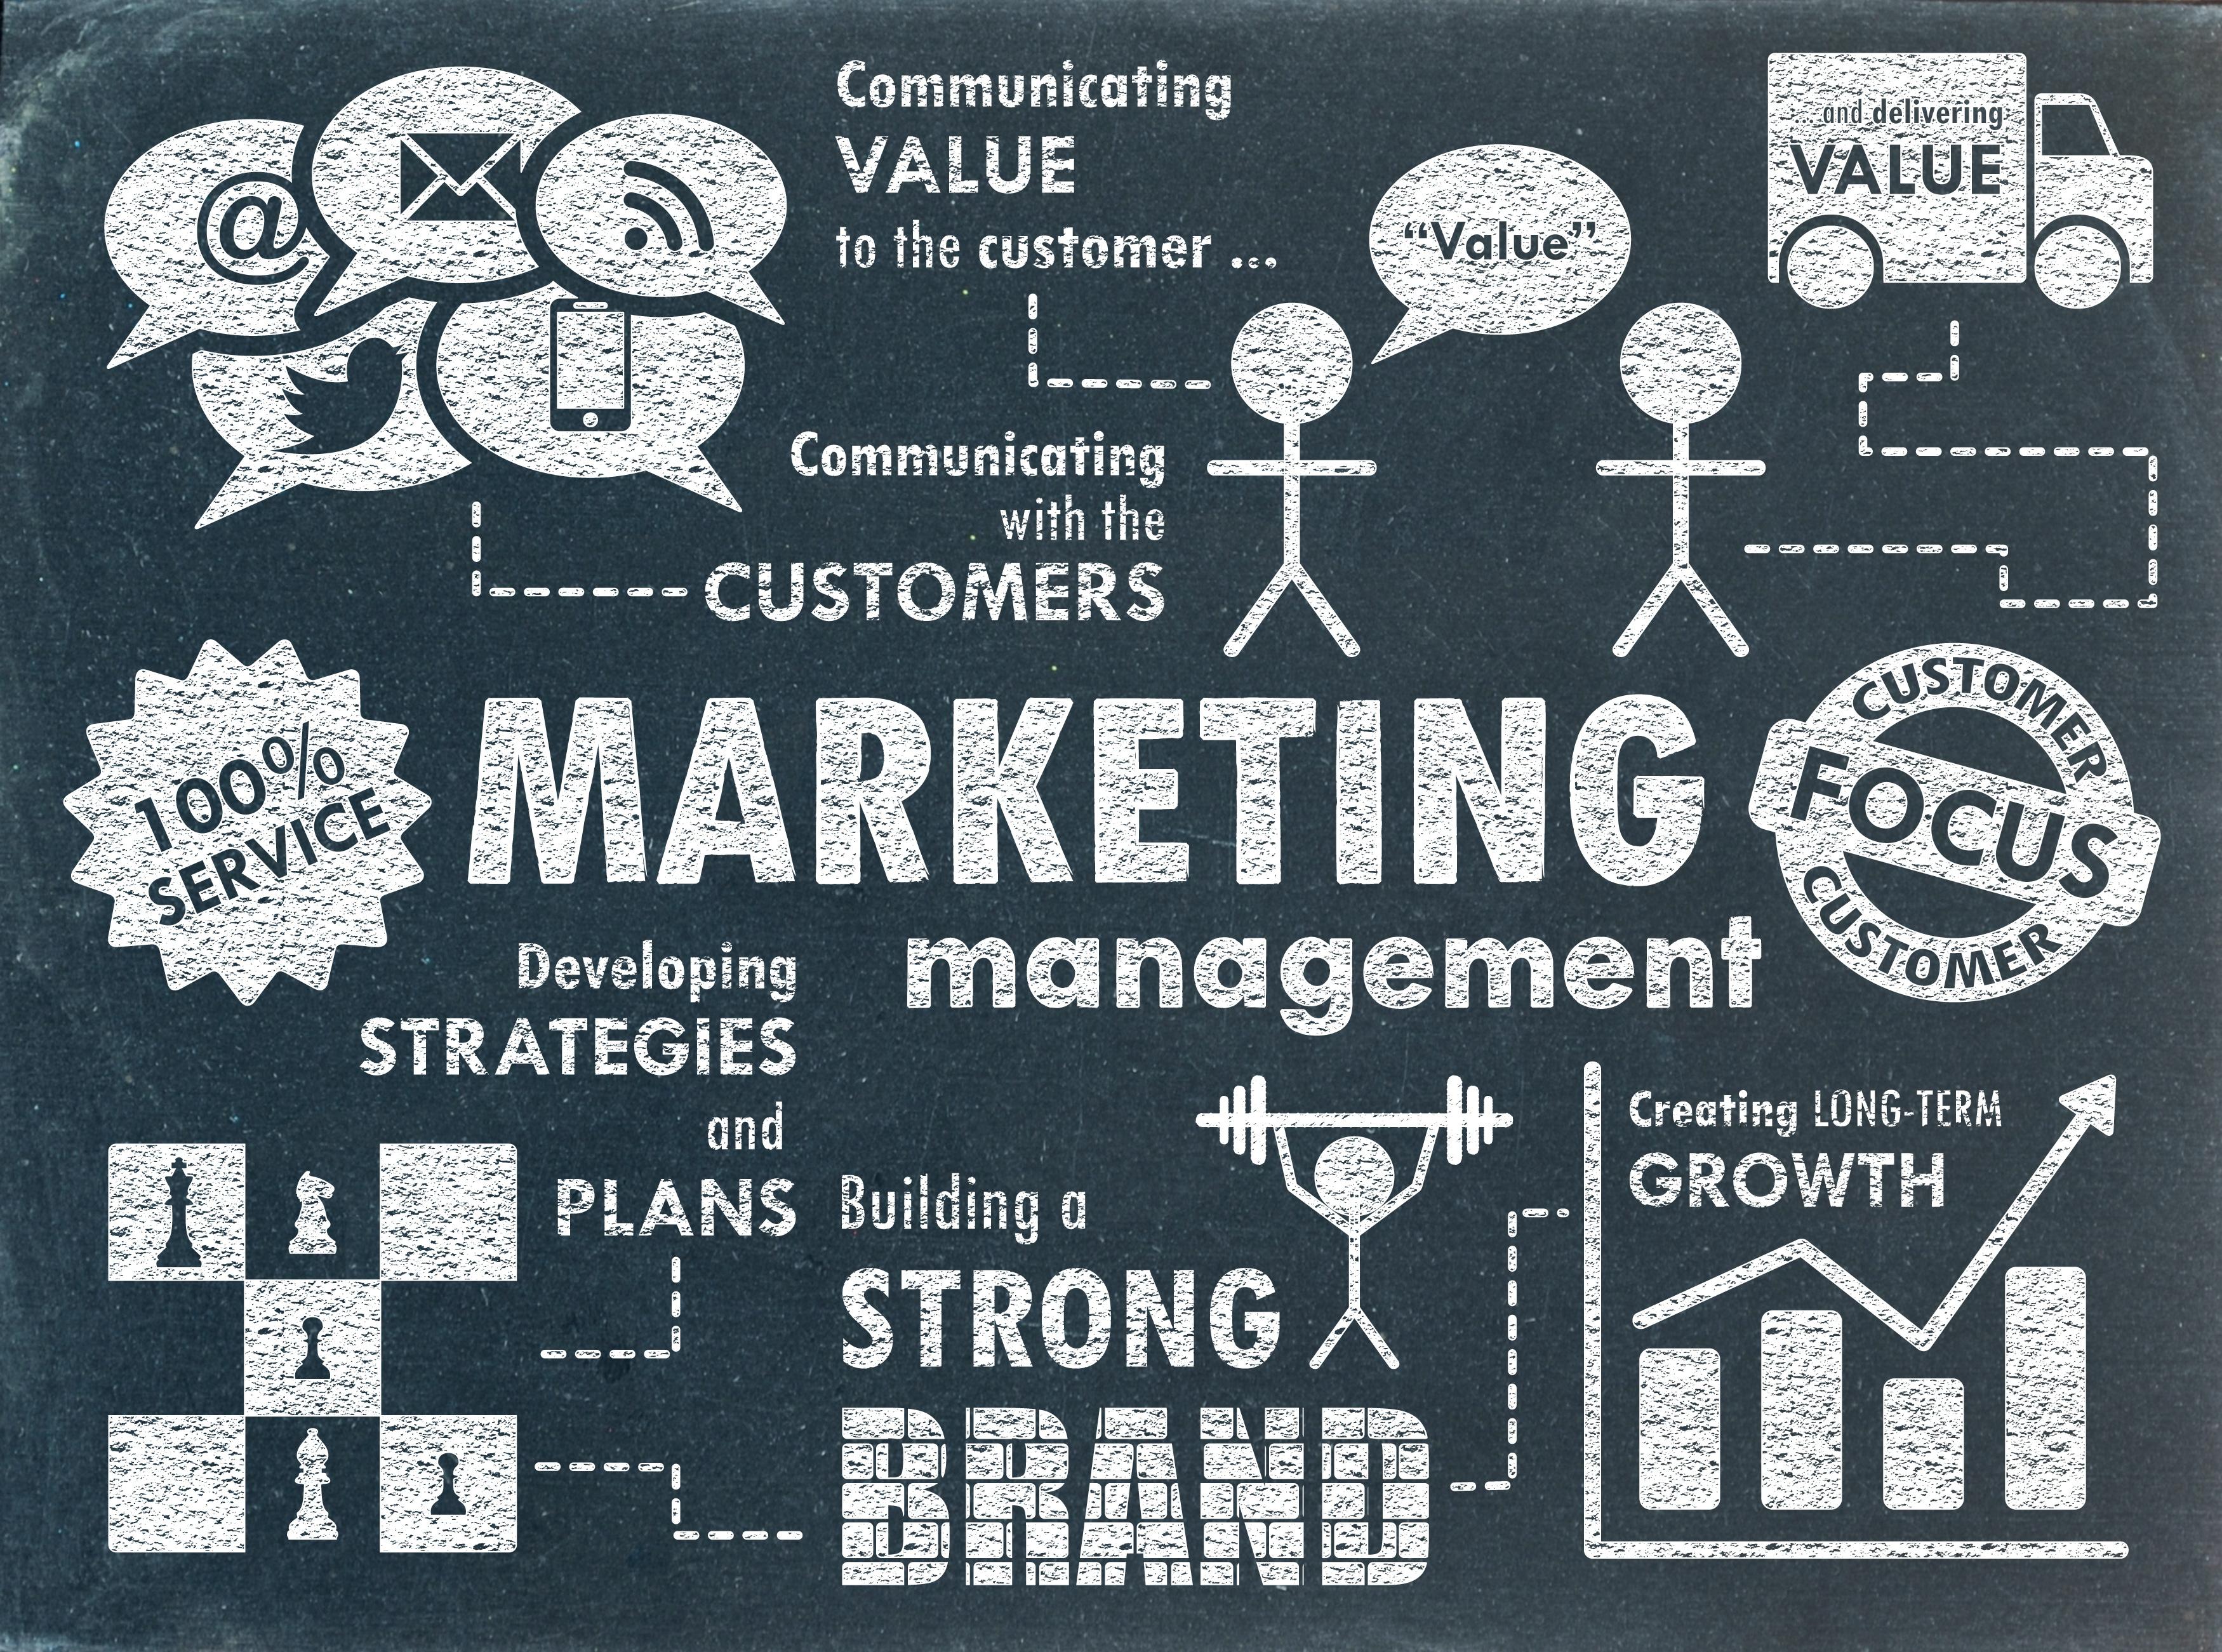 """MARKETING"" Sketch Notes on Blackboard (advertising management)"